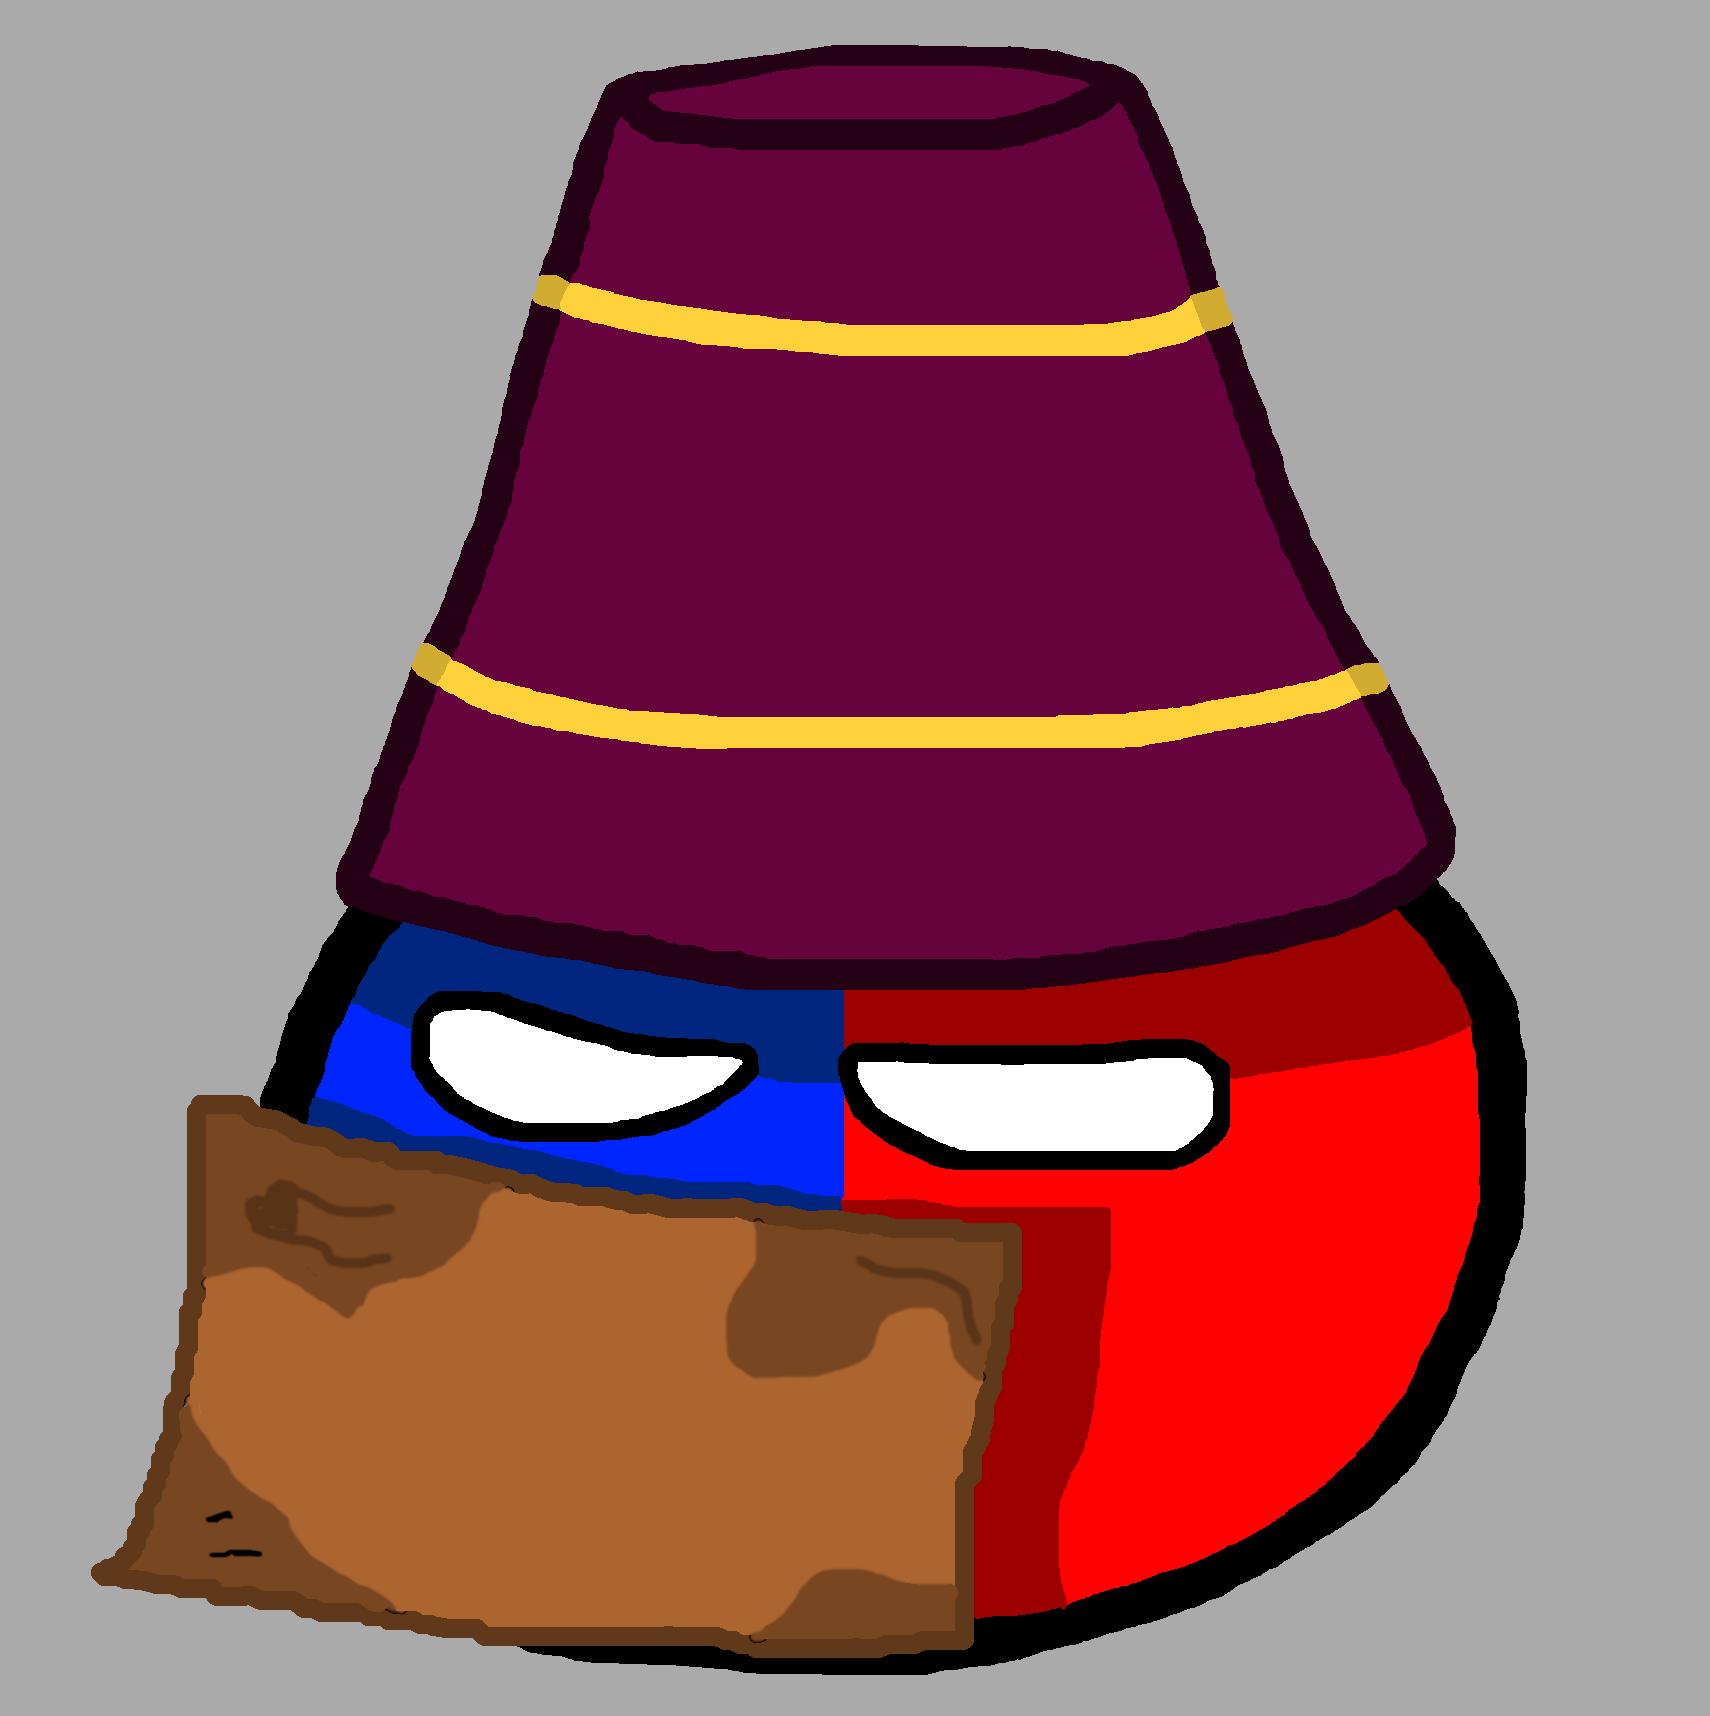 Phoeniciaball